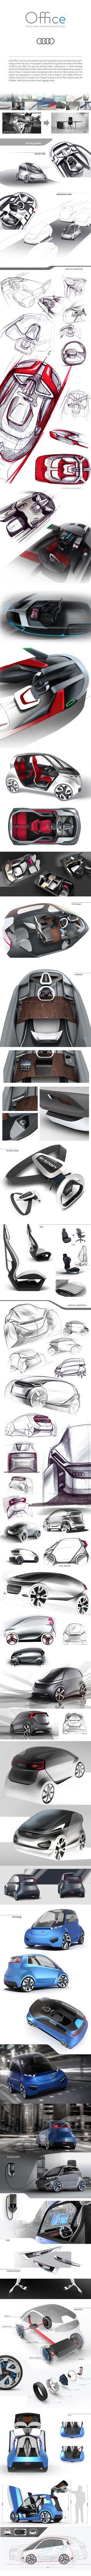 Audi Office concept by Konrad Cholewka, via Behance